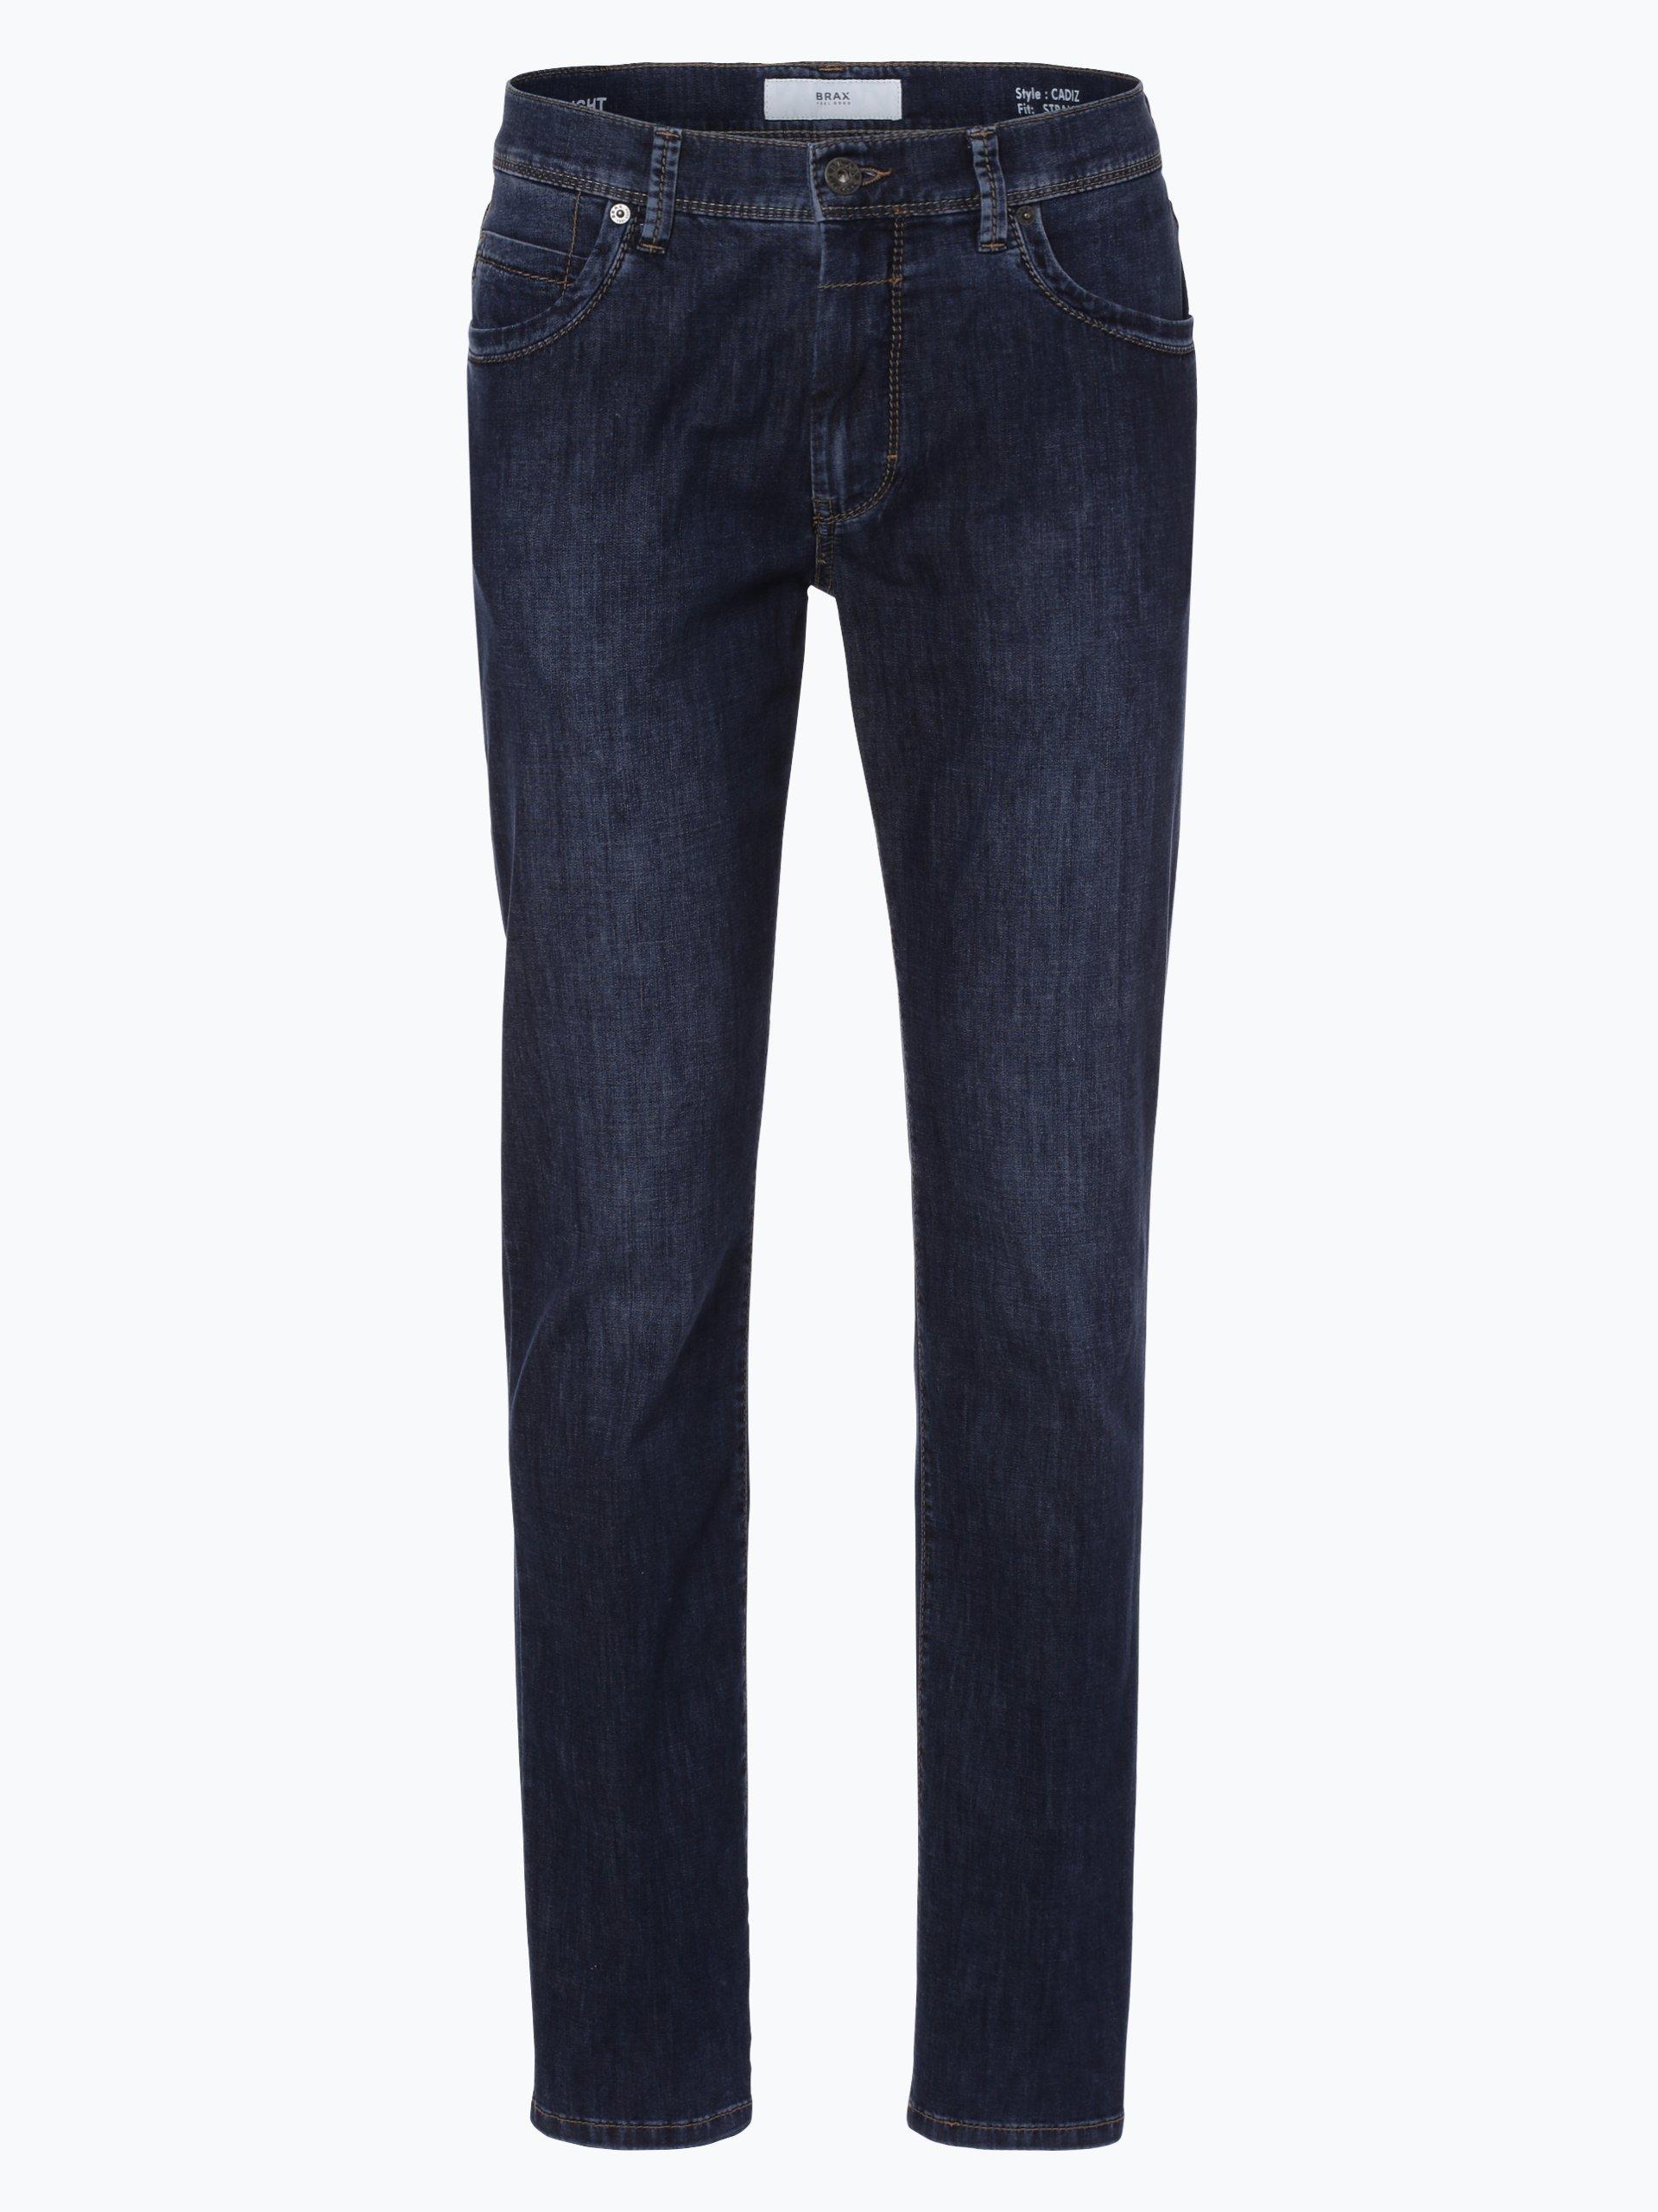 brax herren jeans cadiz dark stone uni online kaufen vangraaf com. Black Bedroom Furniture Sets. Home Design Ideas